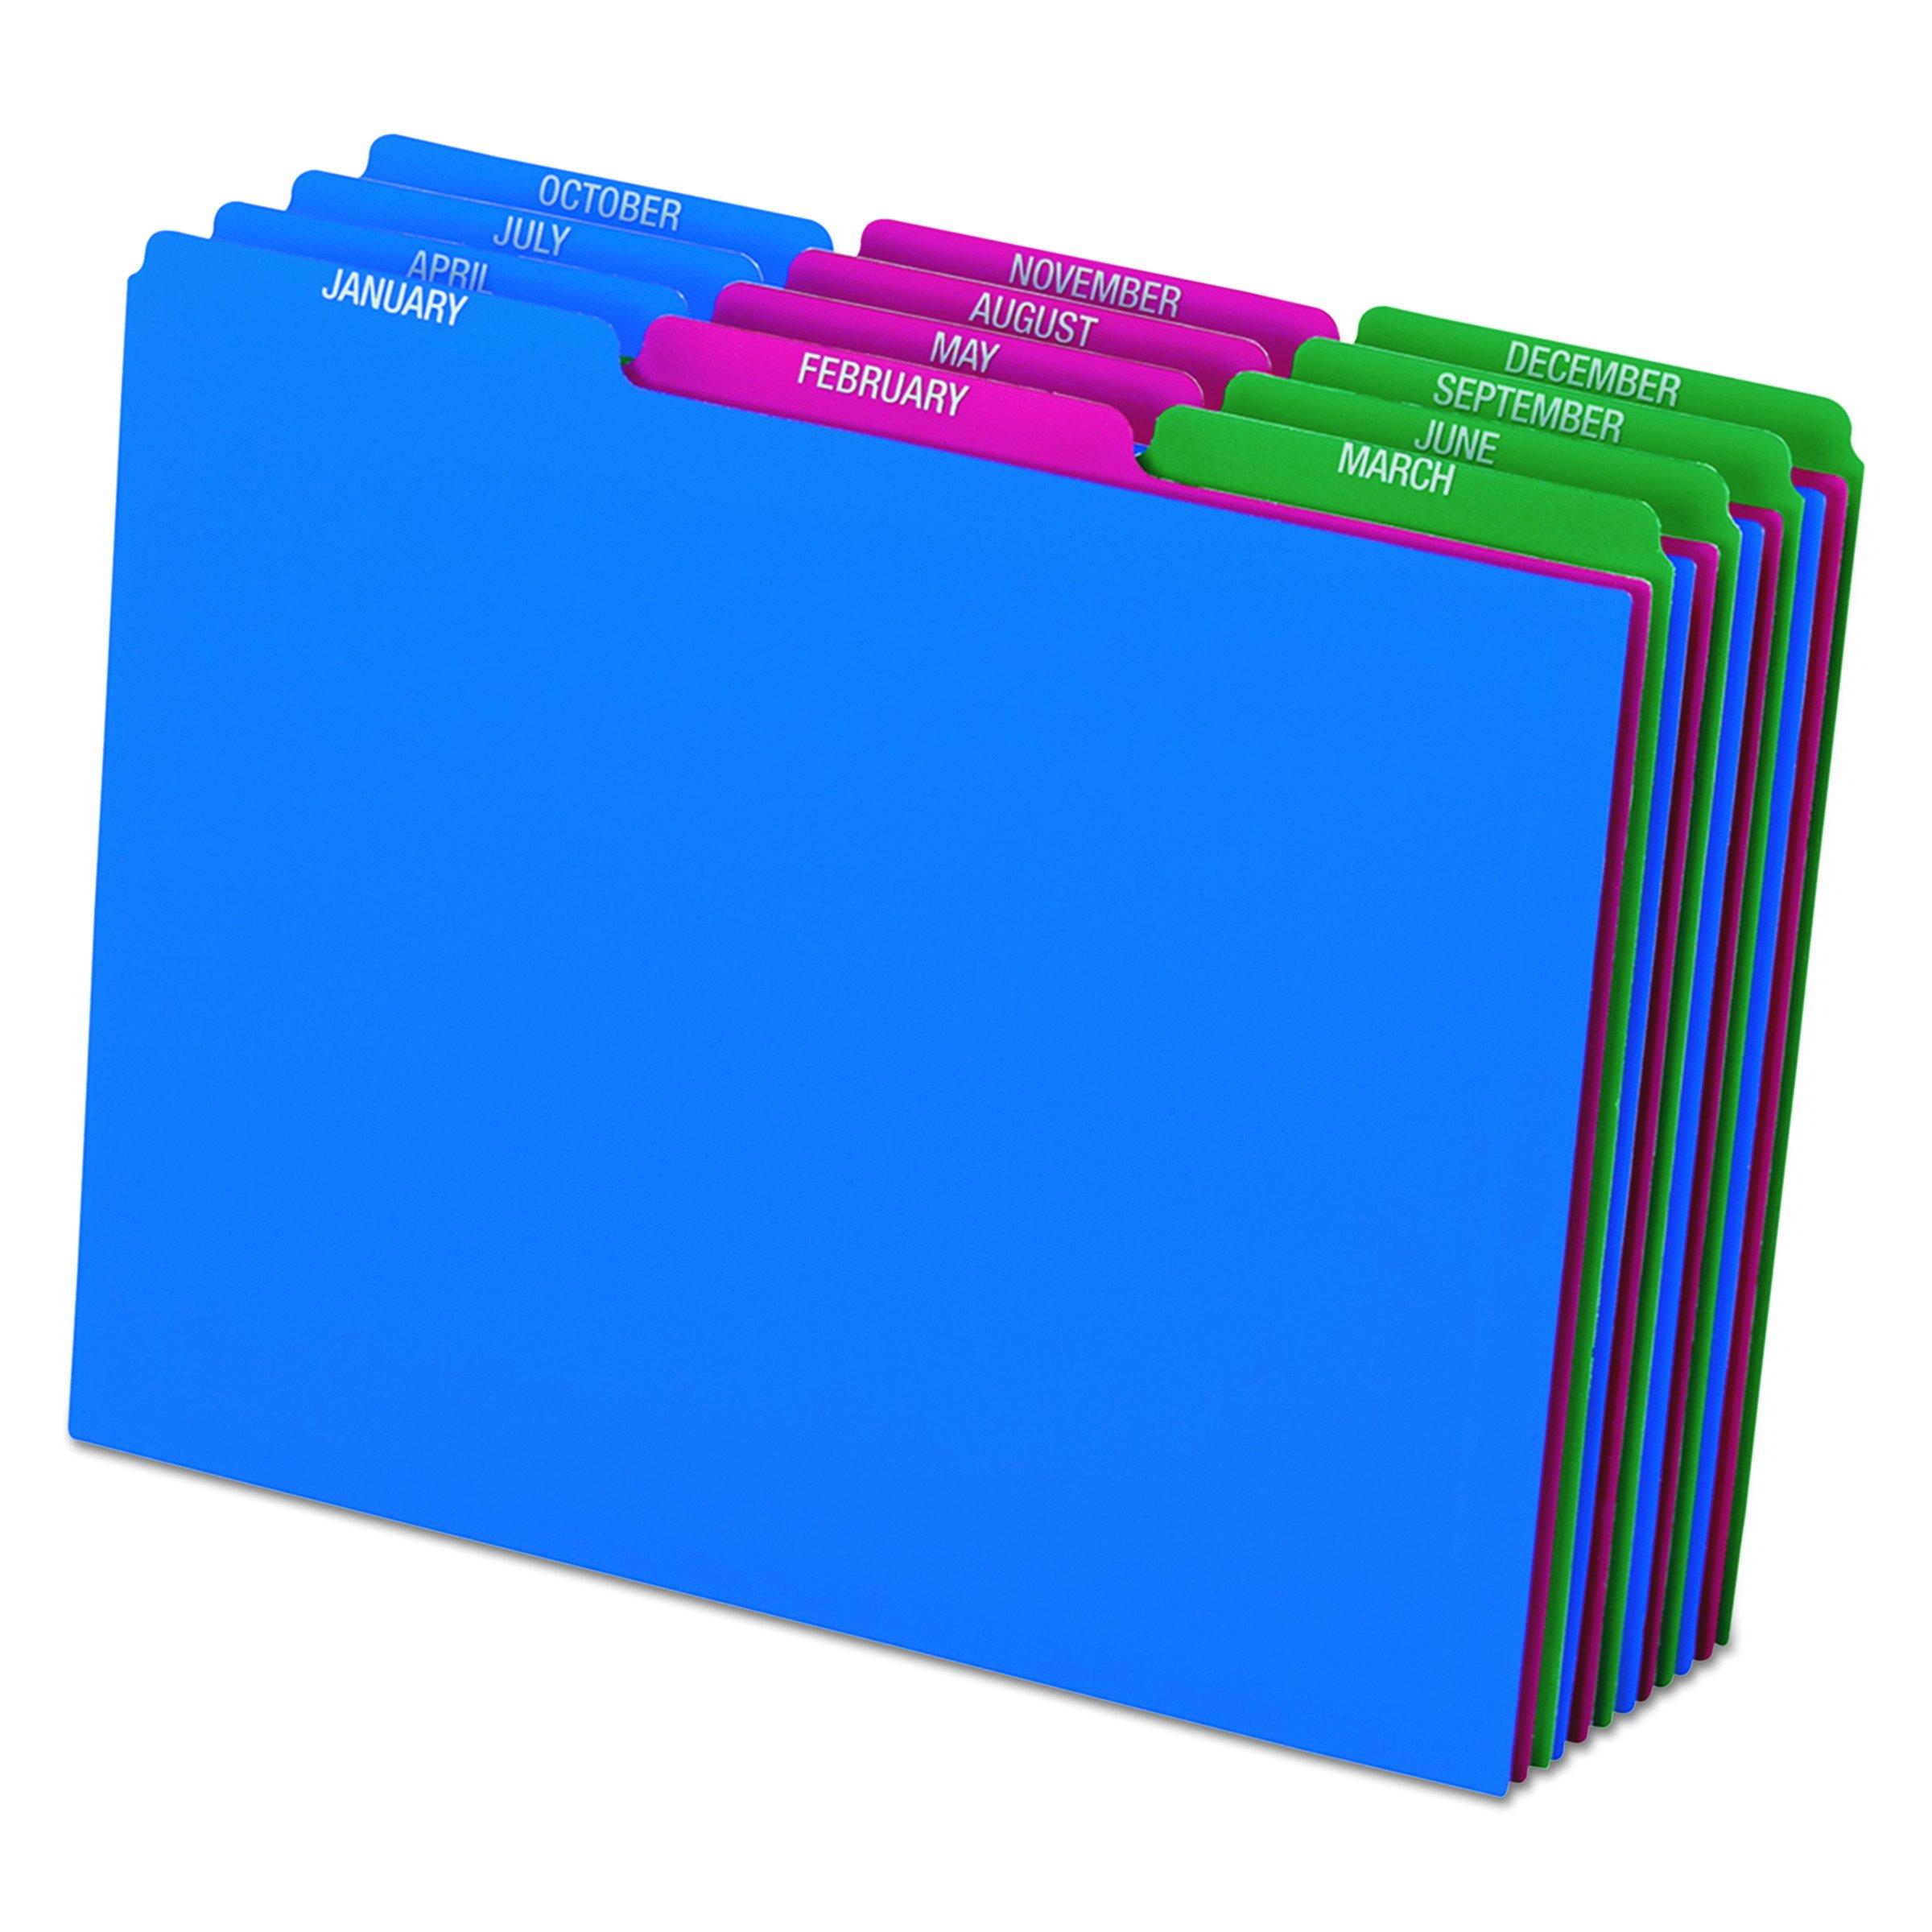 Pendaflex 40144 Top Tab File Guides, Monthly/Jan-Dec, 1/3 Tab, Polypropylene, Letter (Set of 12)